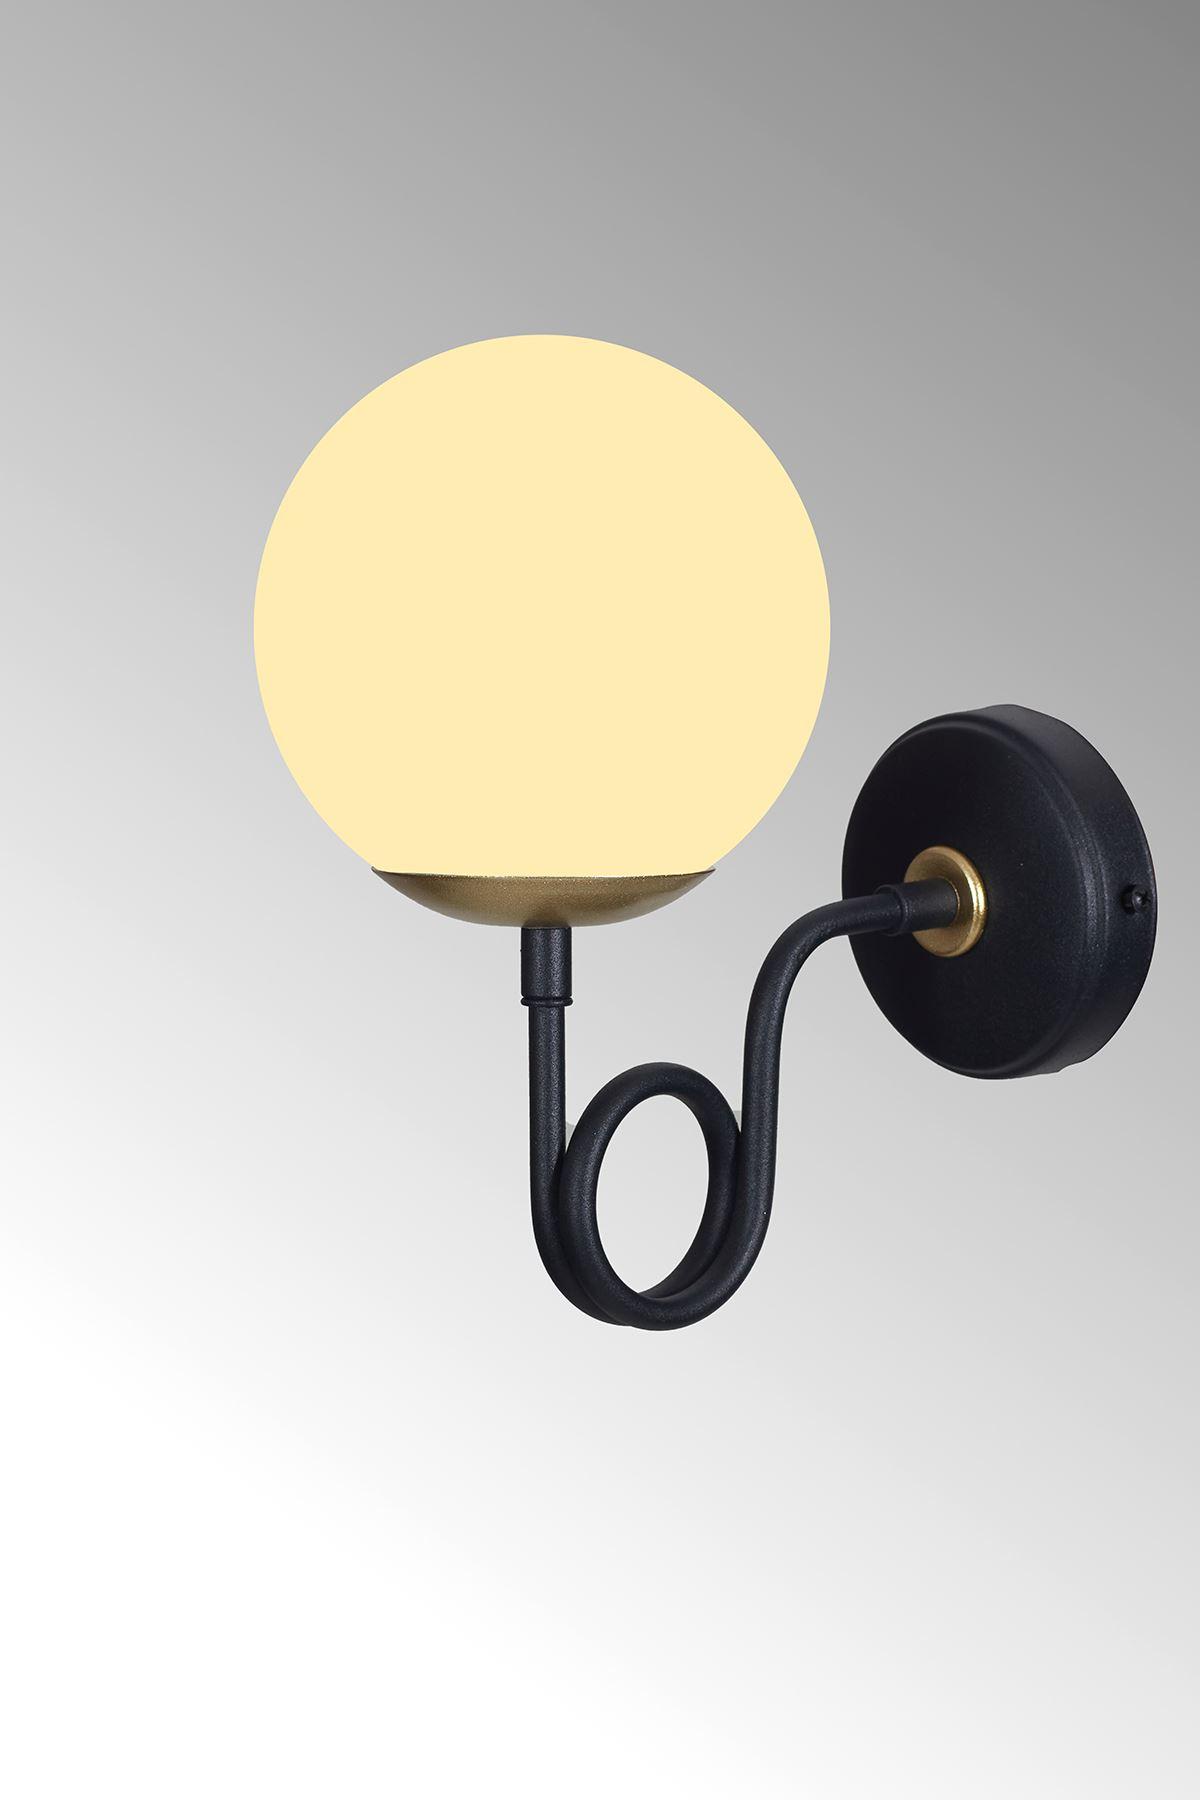 Gali Sarı-Siyah Metal Gövde Beyaz Camlı Tasarım Lüx Aplik